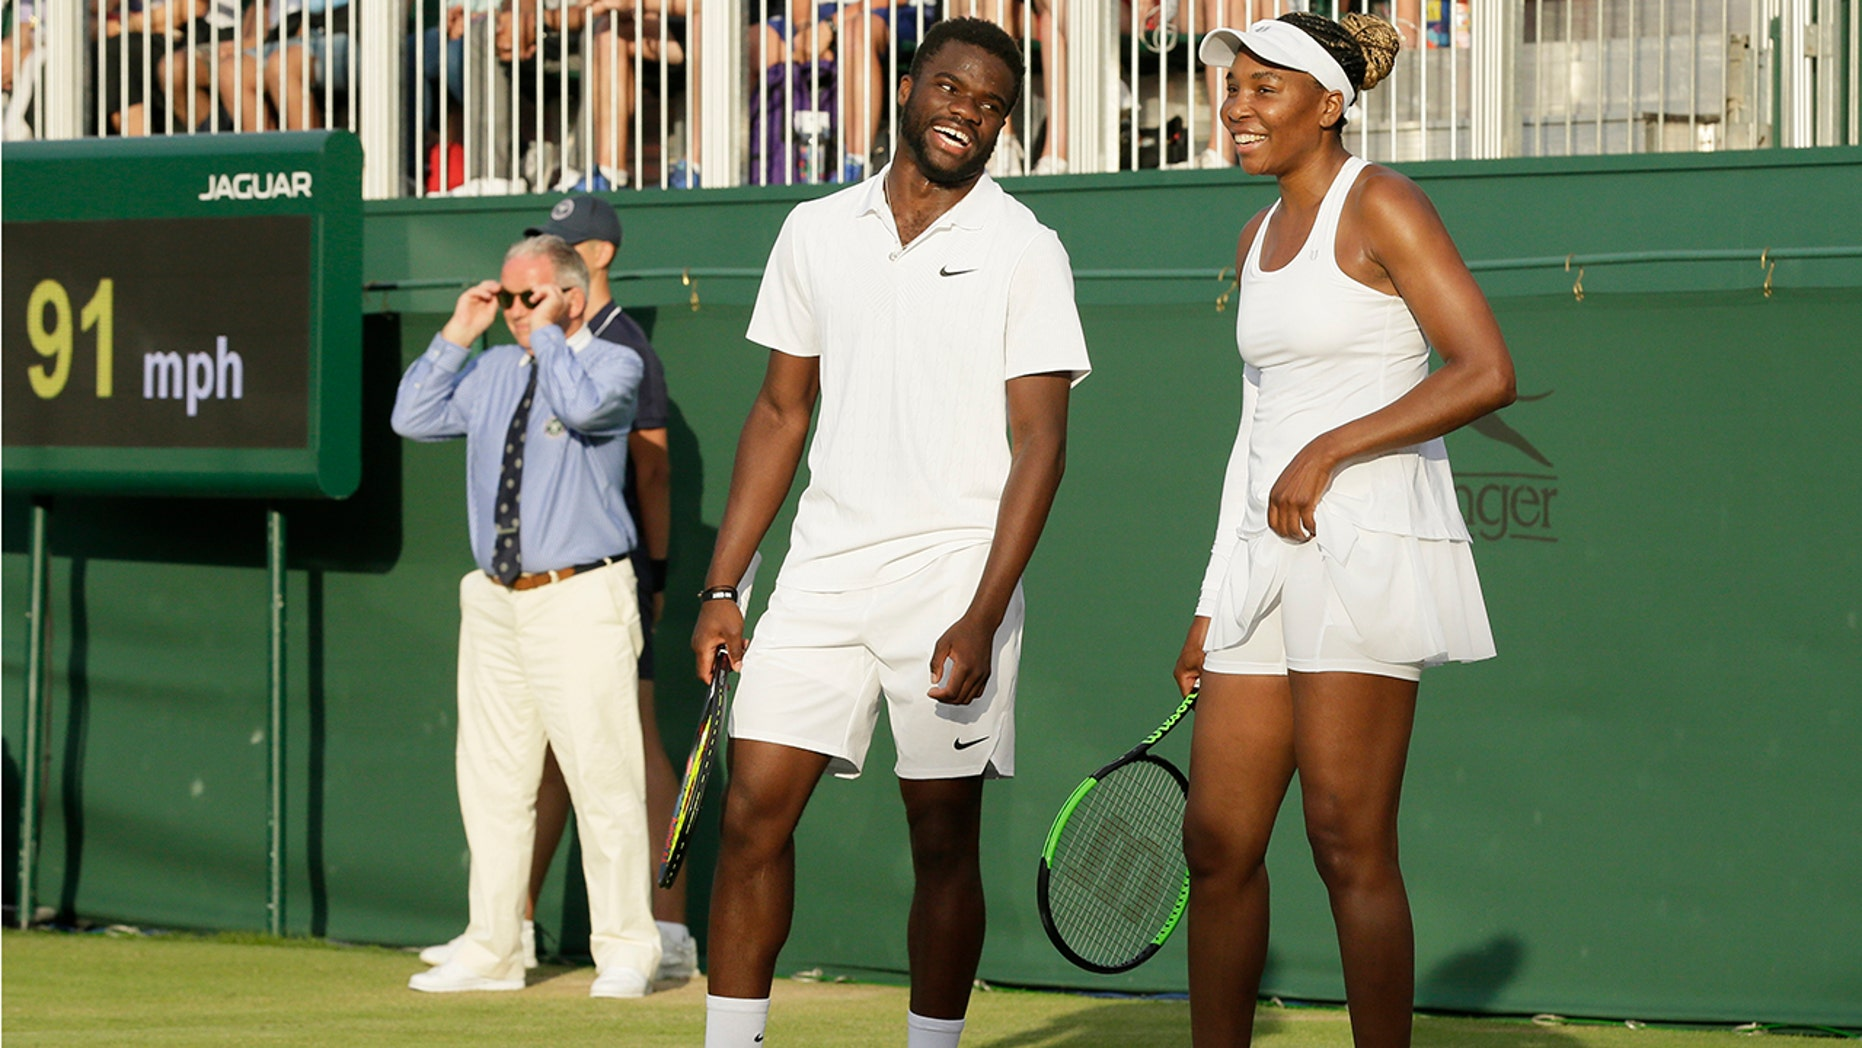 Westlake Legal Group TEN-Venus-Williams Venus Williams to play San Jose for second straight year fox-news/sports/tennis fnc/sports fnc c6cc0815-f7ce-551c-bf20-b22cd0d7b02e Associated Press article